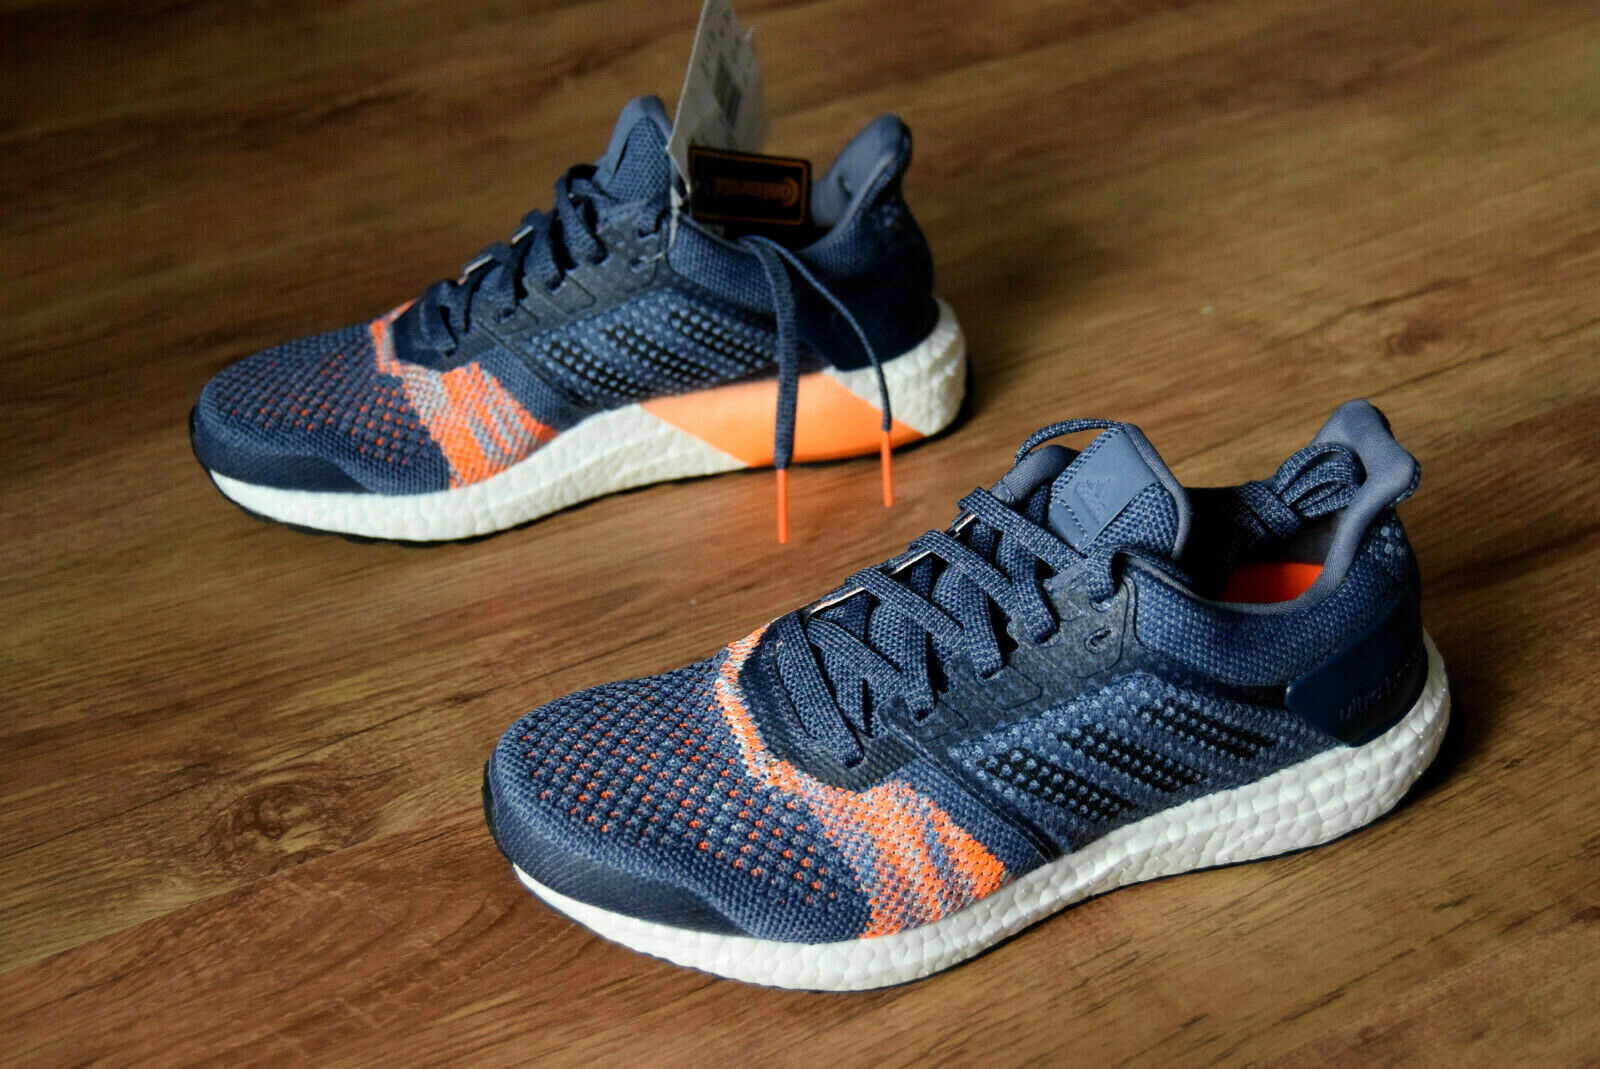 Adidas ultra boost st w 37 38 40 40,5 42 cq2133 consortium primeknit pure r1 nmd